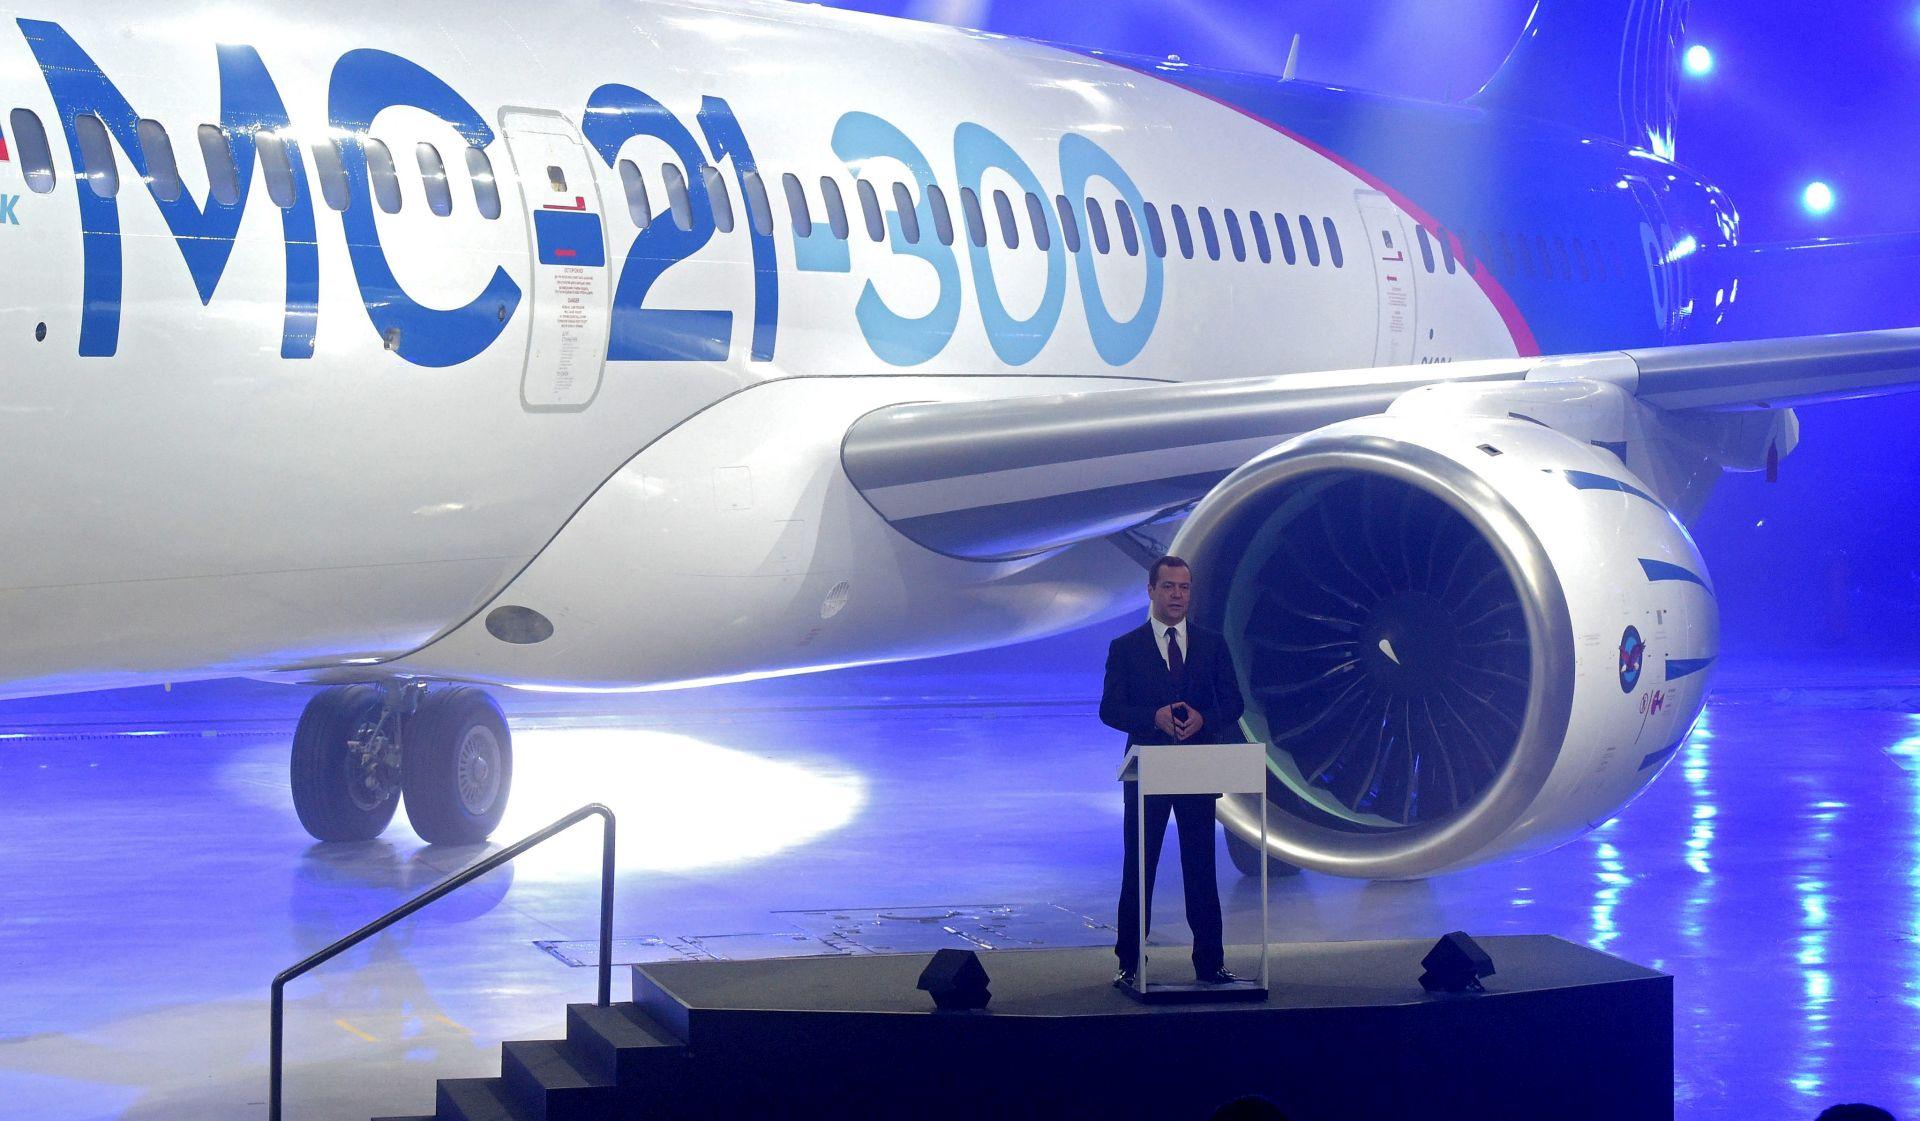 MS-21 Novi ruski zrakoplov konkurentan Boeingu i Airbusu